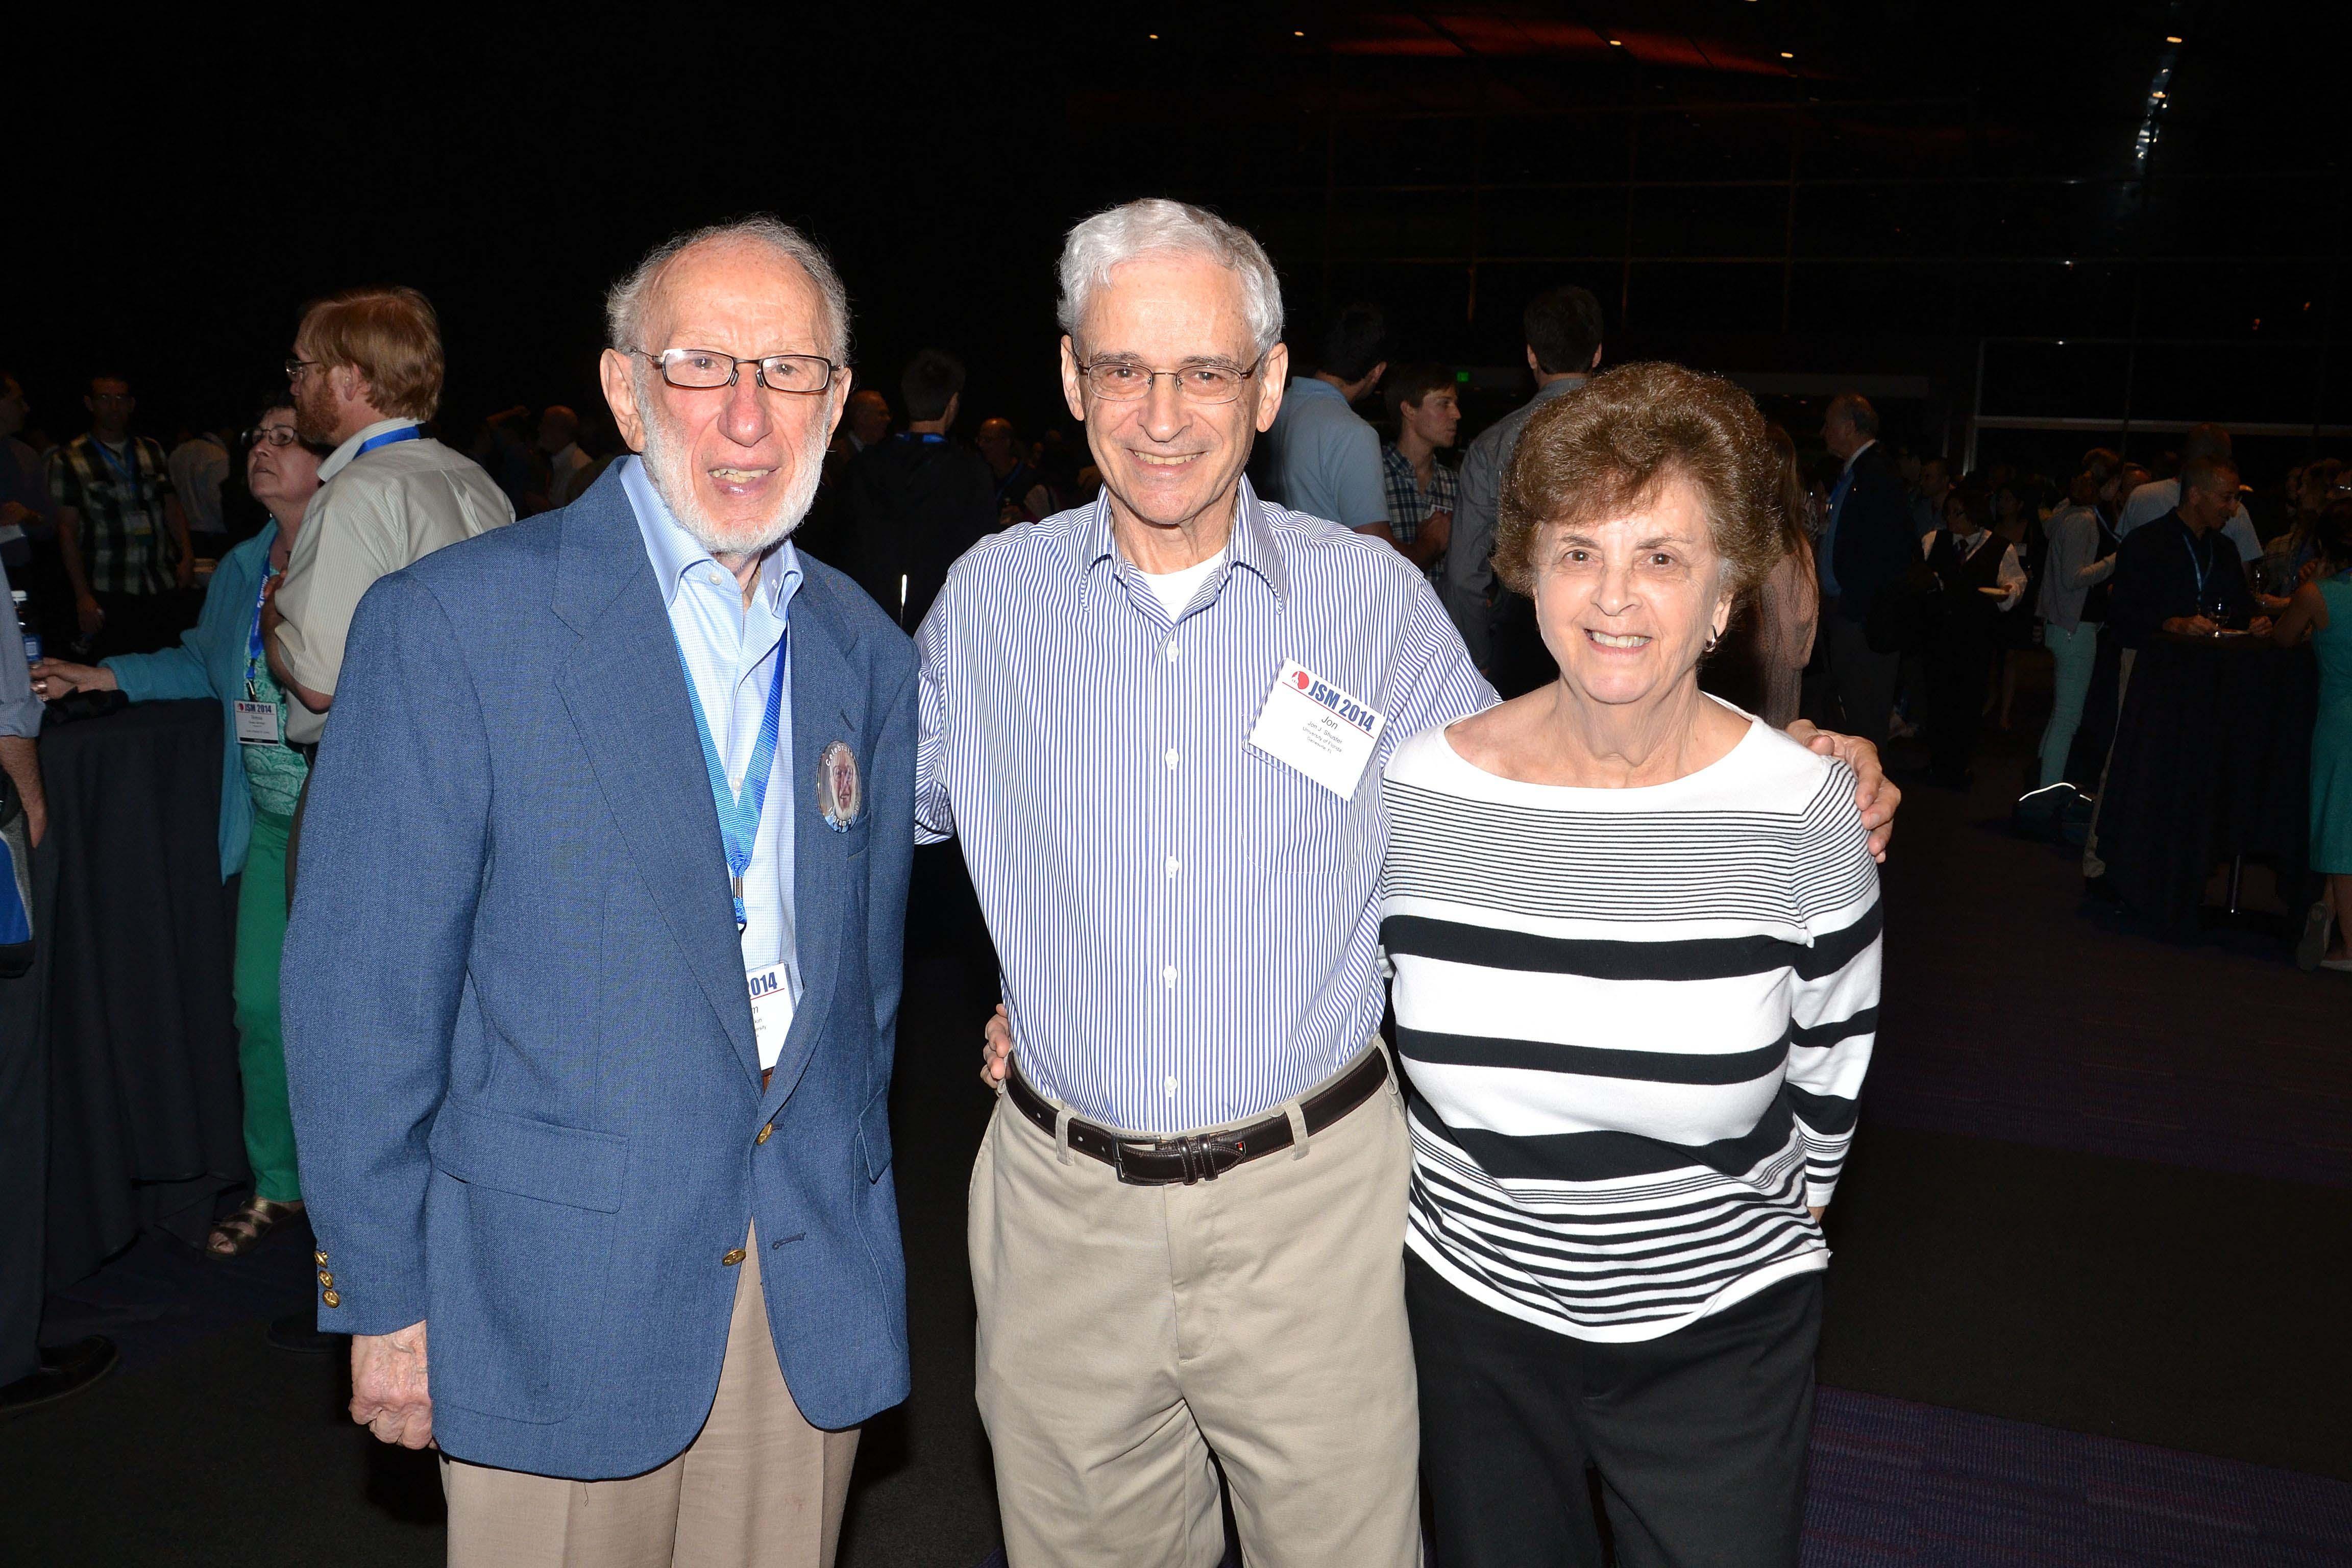 Ingram Olkin, John Shuster, and Sandy Shuster catch up during the Opening Mixer